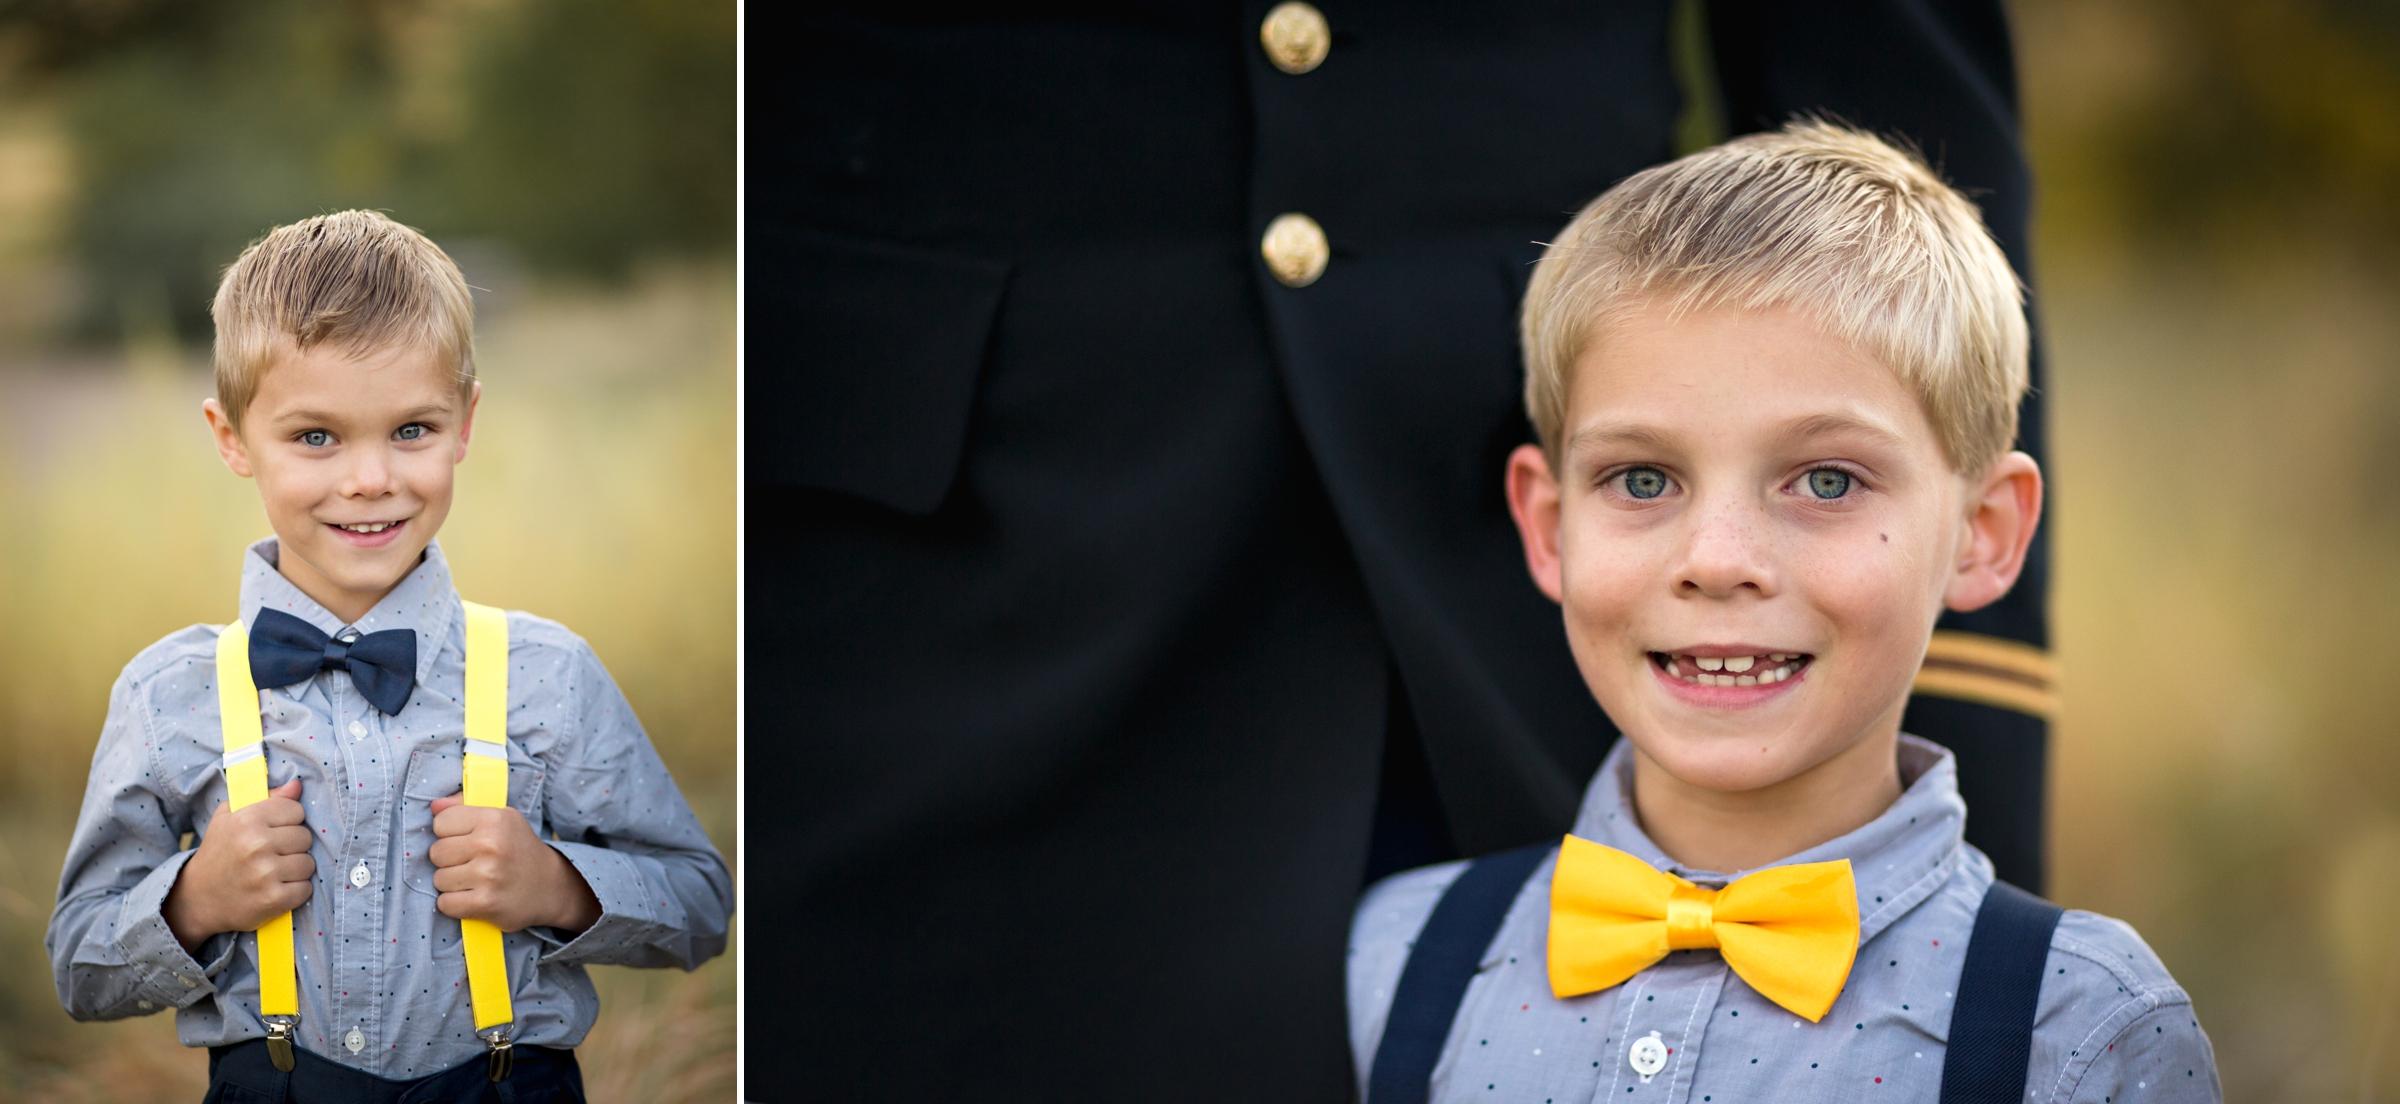 colorado children photography, denver children photographer